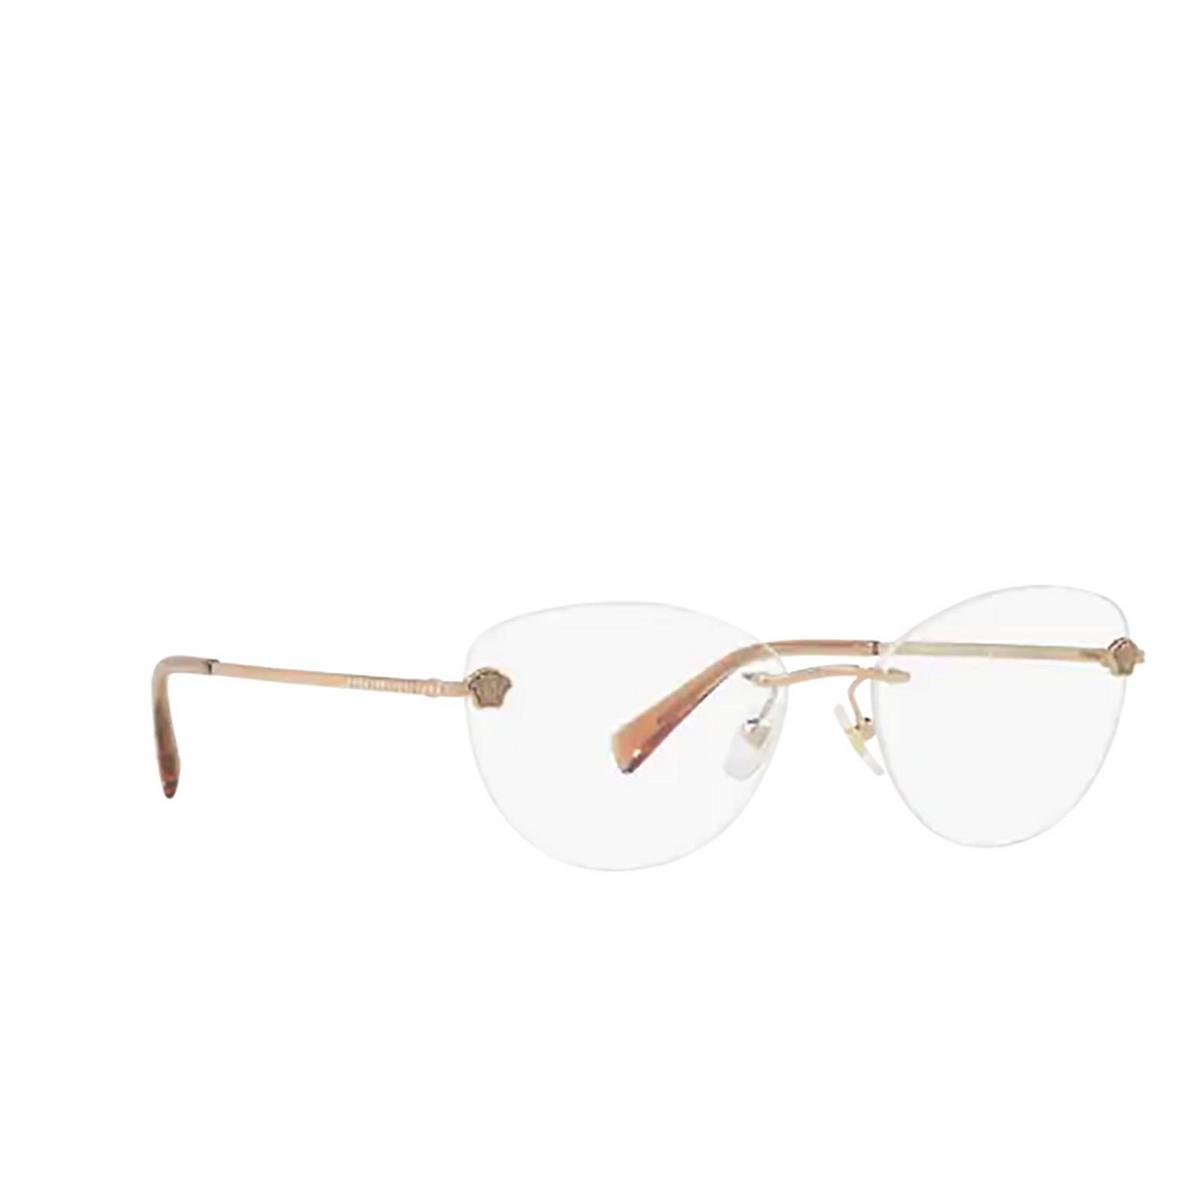 Versace® Oval Eyeglasses: VE1248B color Bronze-copper 1052 - three-quarters view.